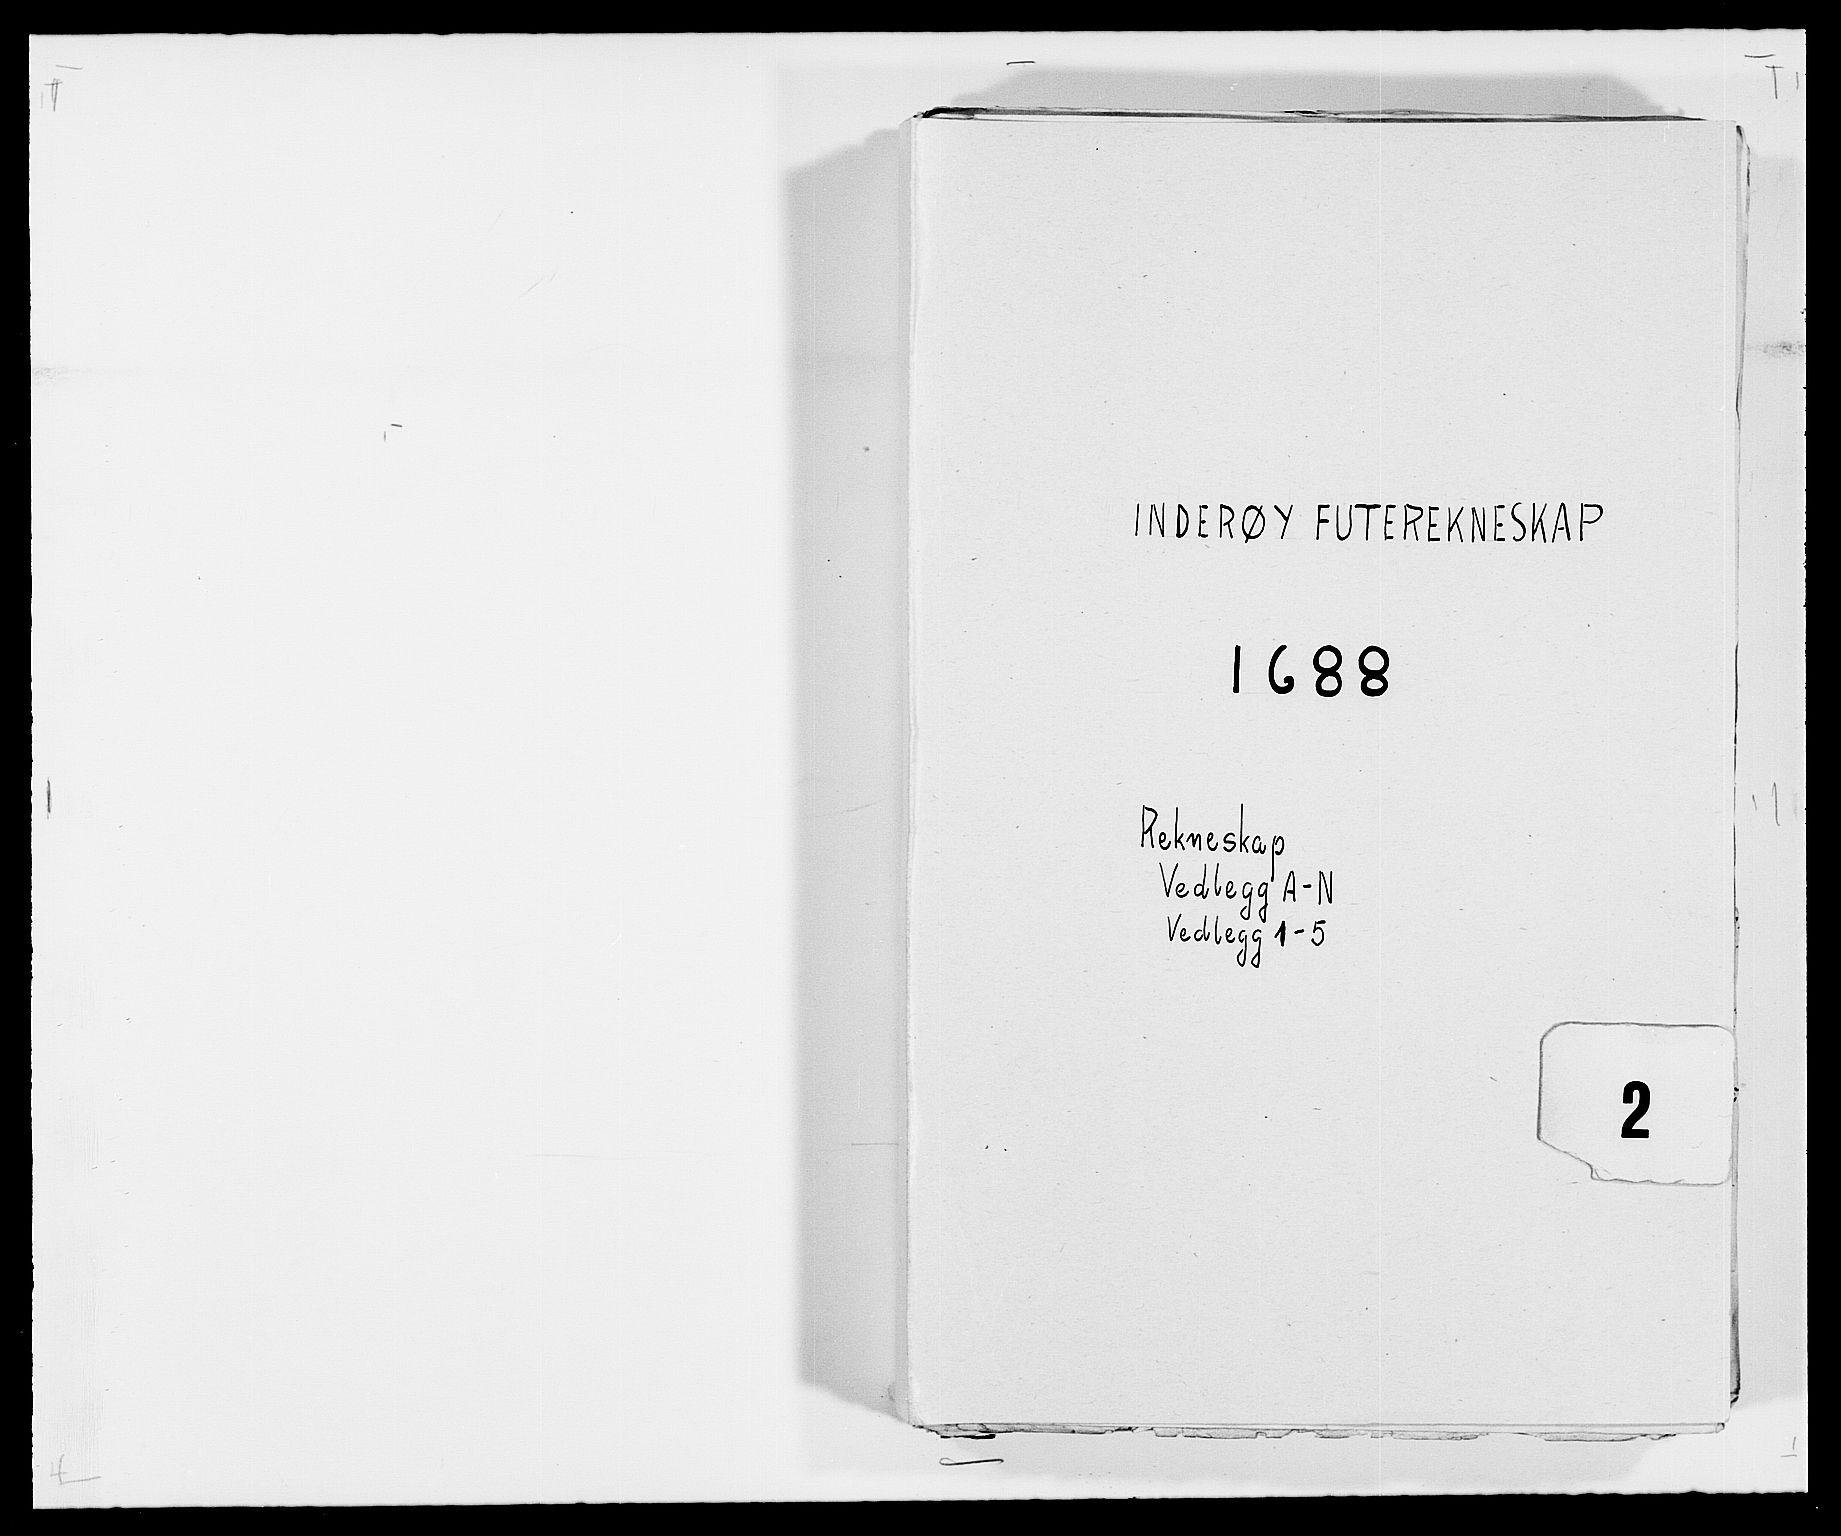 RA, Rentekammeret inntil 1814, Reviderte regnskaper, Fogderegnskap, R63/L4306: Fogderegnskap Inderøy, 1687-1689, s. 231